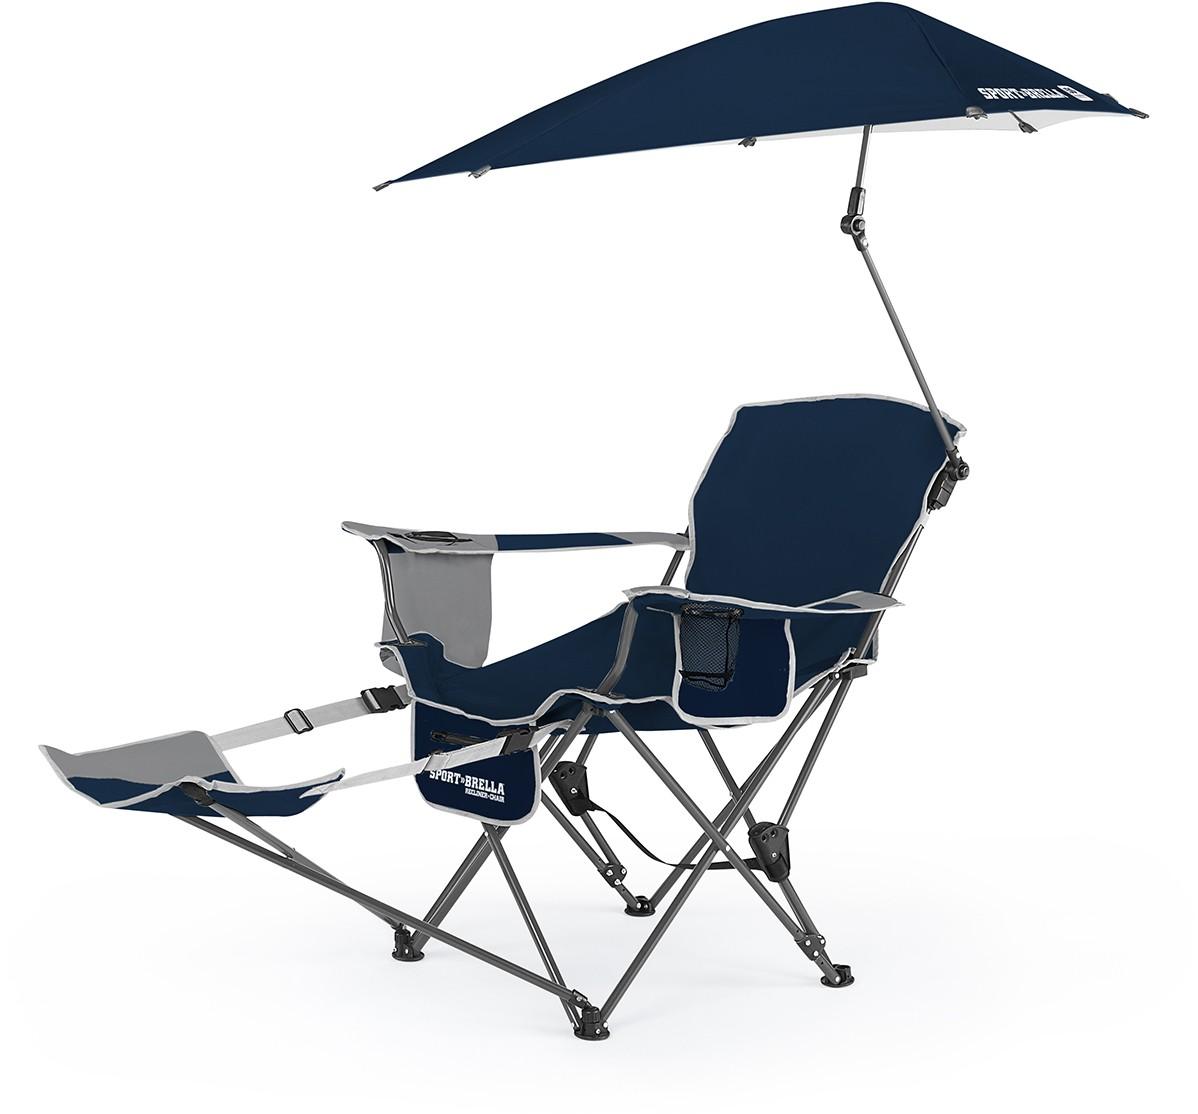 SKLZ Sport Brella Recliner Folding Chair W/ Umbrella U0026 Footrest